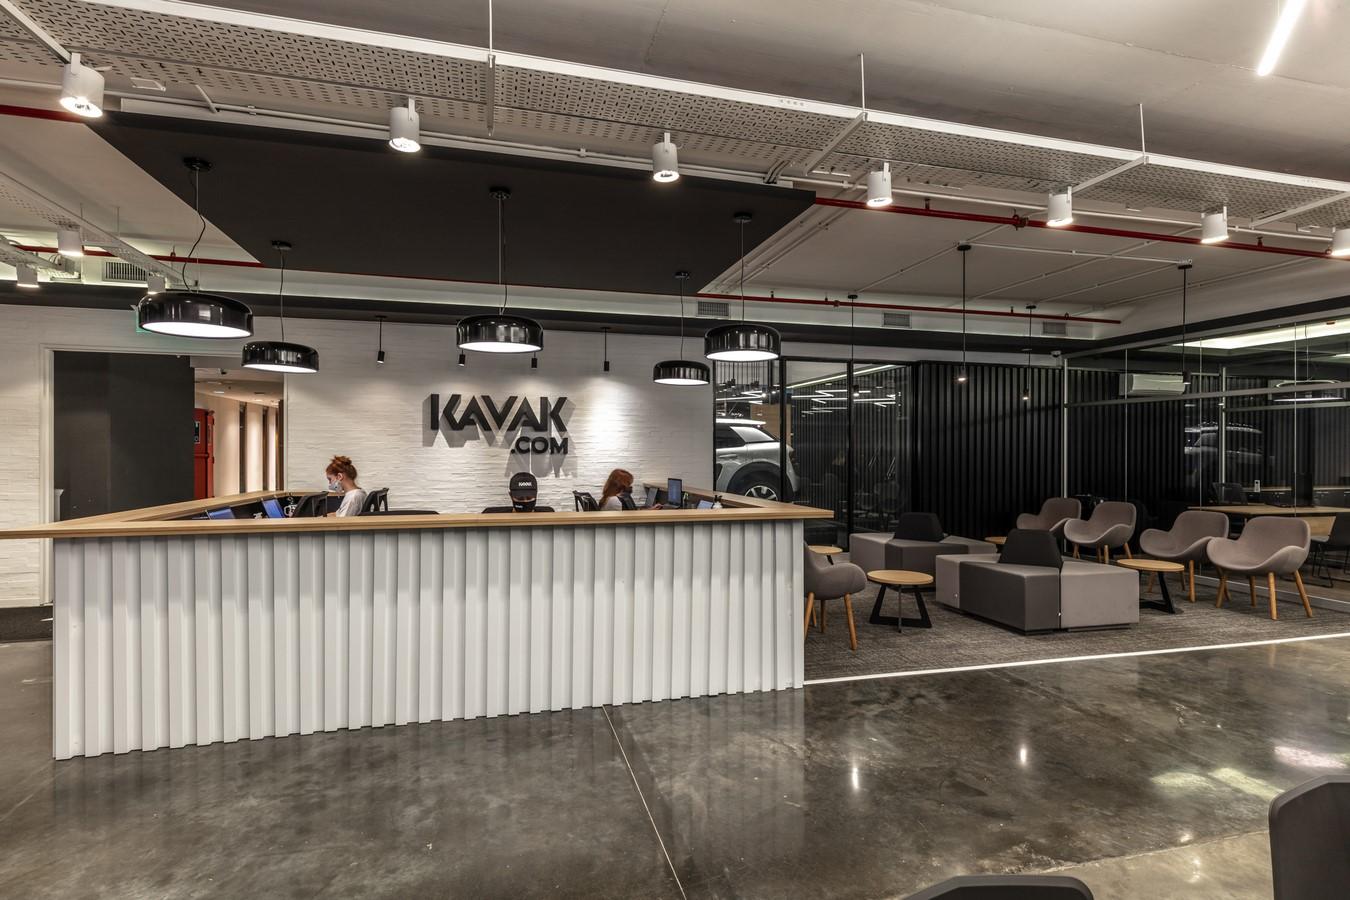 Kavak hub by Hitzig Militello Architects - Sheet1